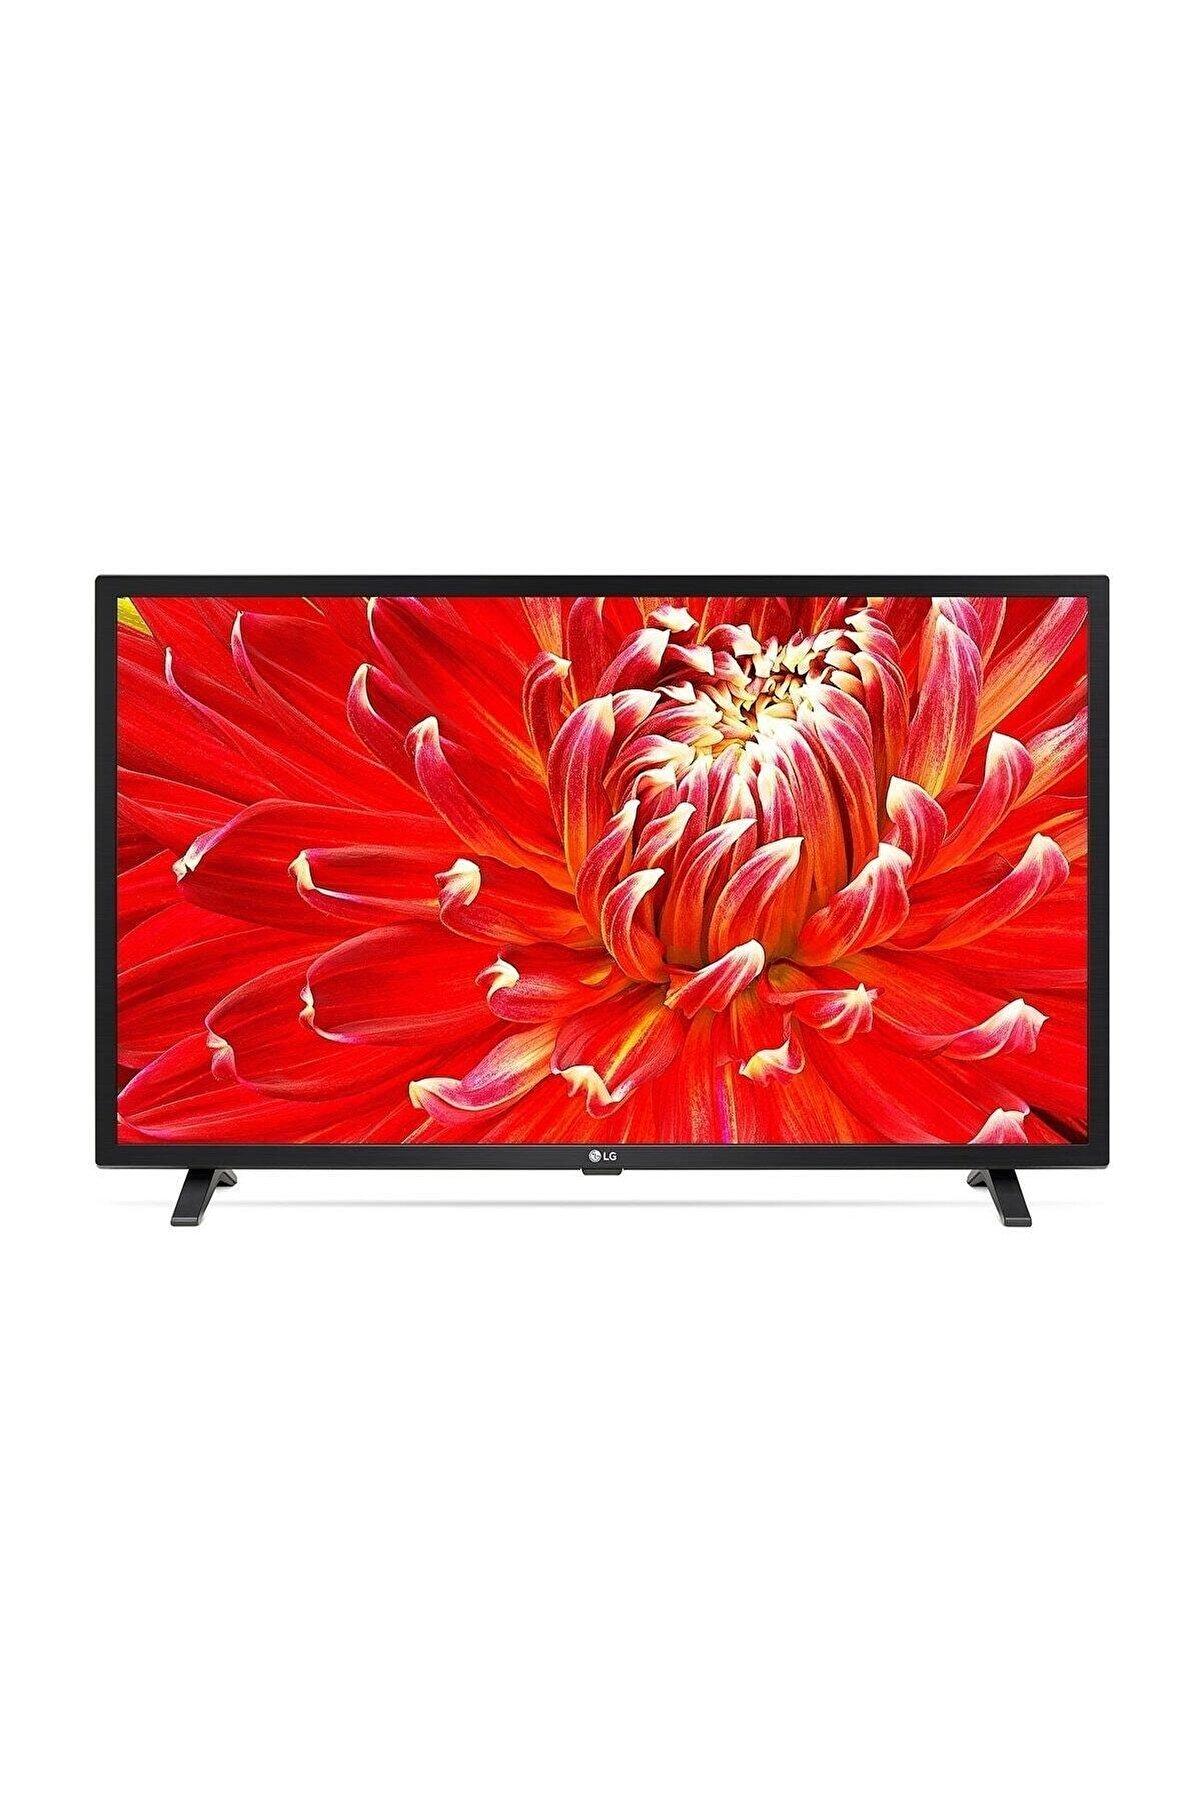 "LG 32LM6300 32"" 81 Ekran Uydu Alıcılı Full HD Smart LED TV"